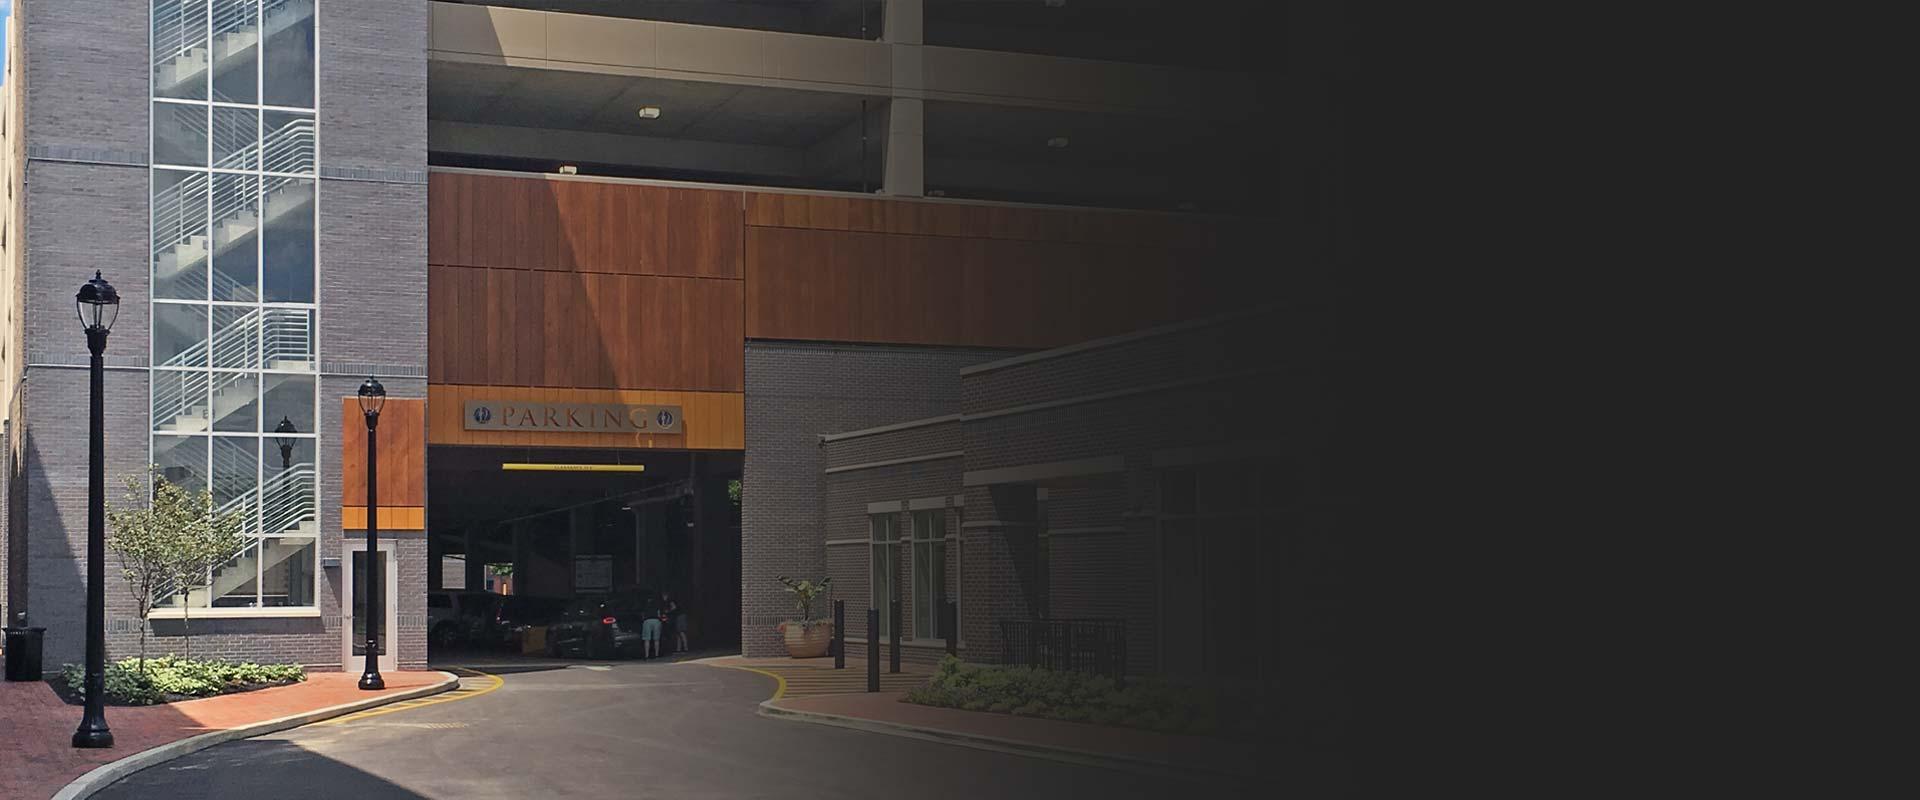 Hyatt Legacy Building Parking Garage Cleveland